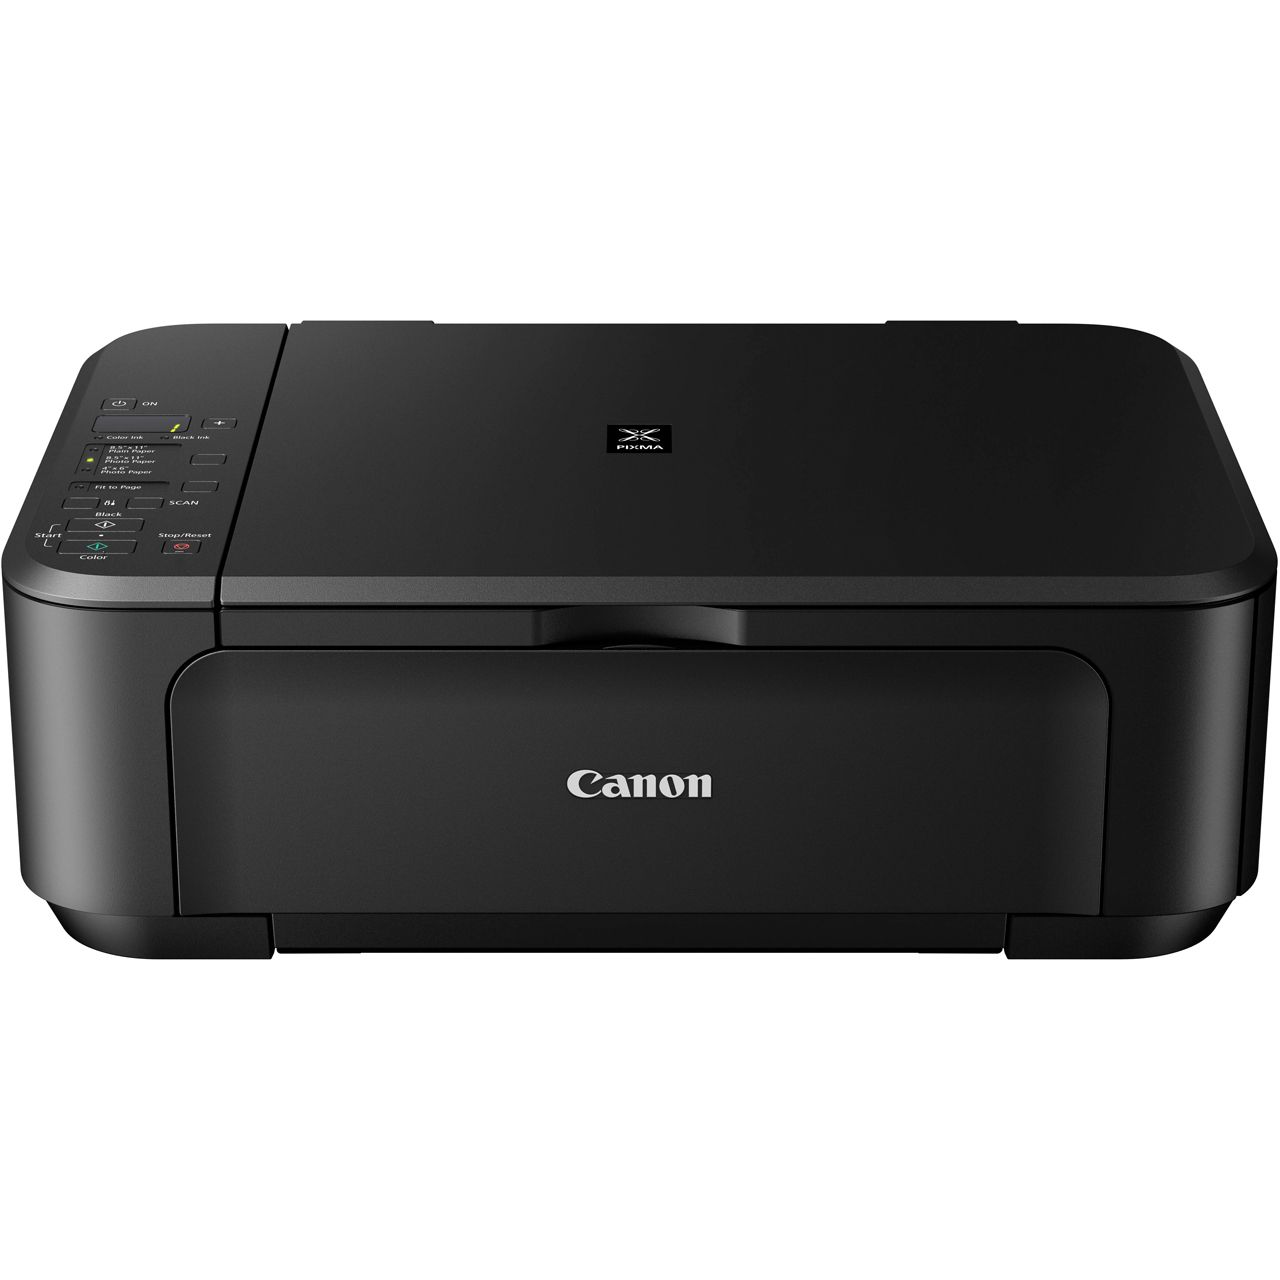 canon pixma mg2250 tinte drucken scannen kopieren usb 2 0. Black Bedroom Furniture Sets. Home Design Ideas